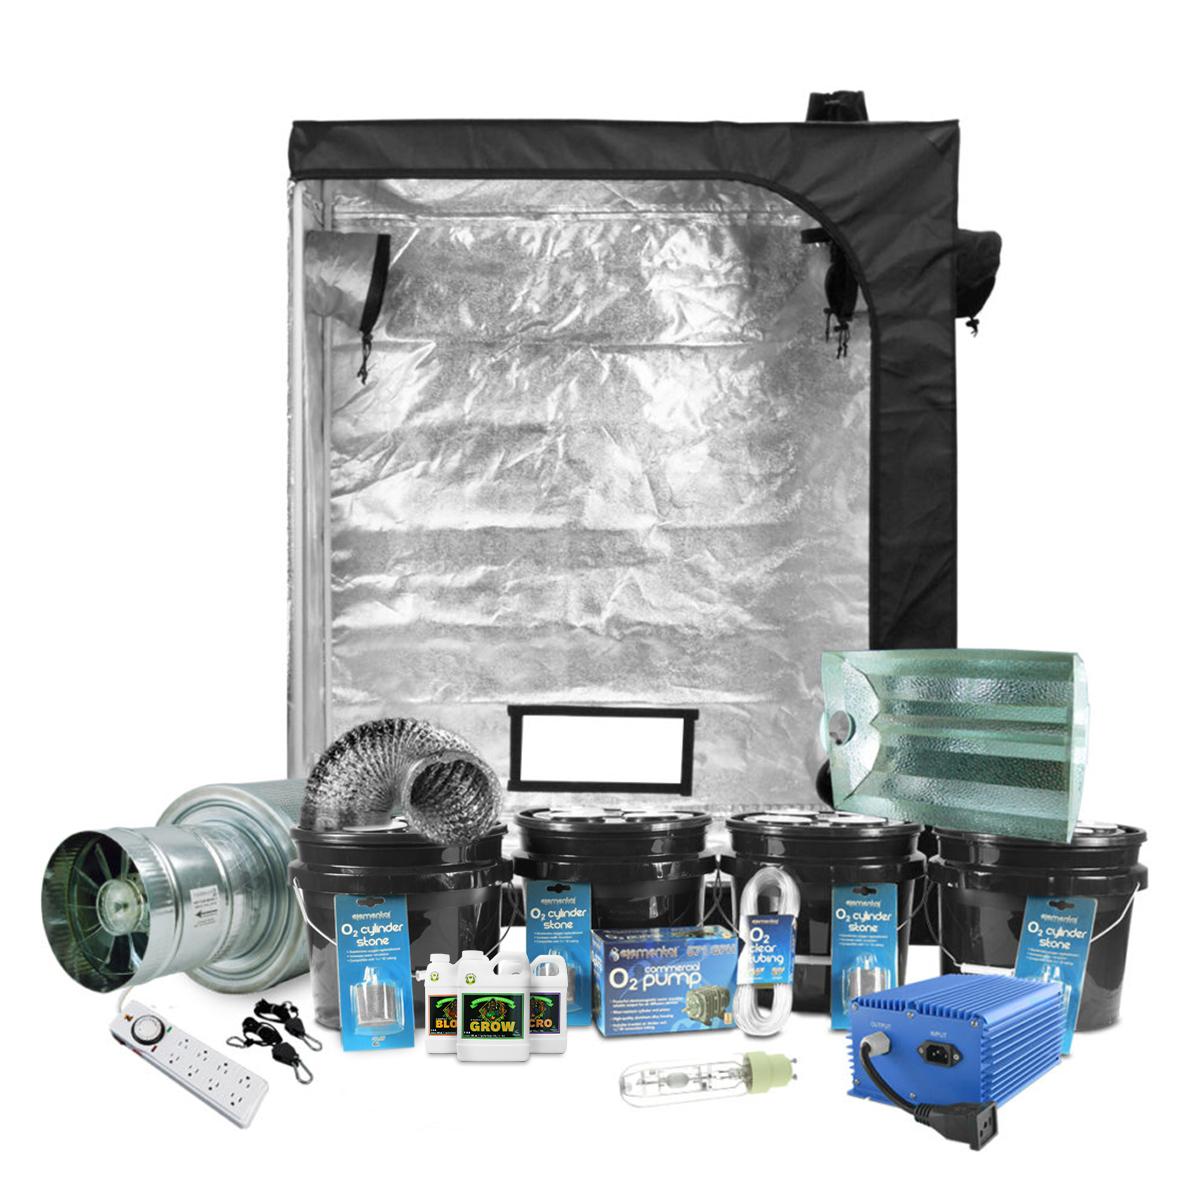 2x4 Hydro Cmh Grow Room Kit Hydroponic Amp 315w Cmh